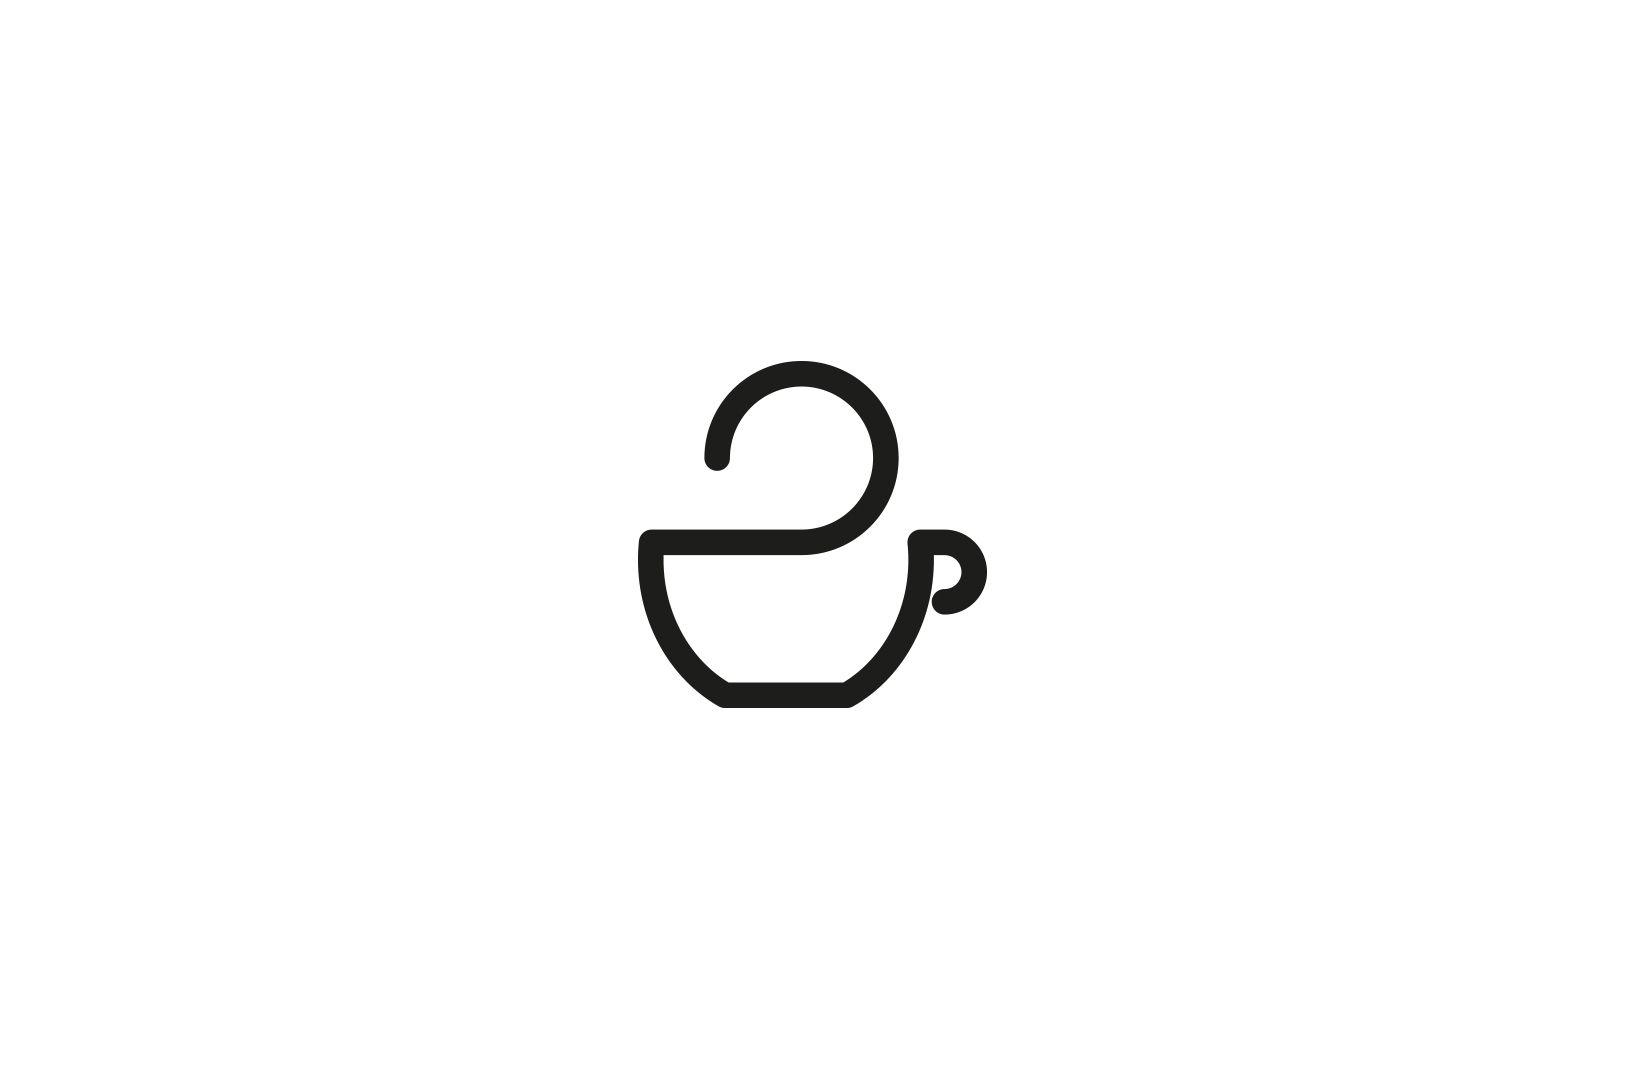 Coffee Cup Logo Black And White Joanna Kosinska Dengan Gambar